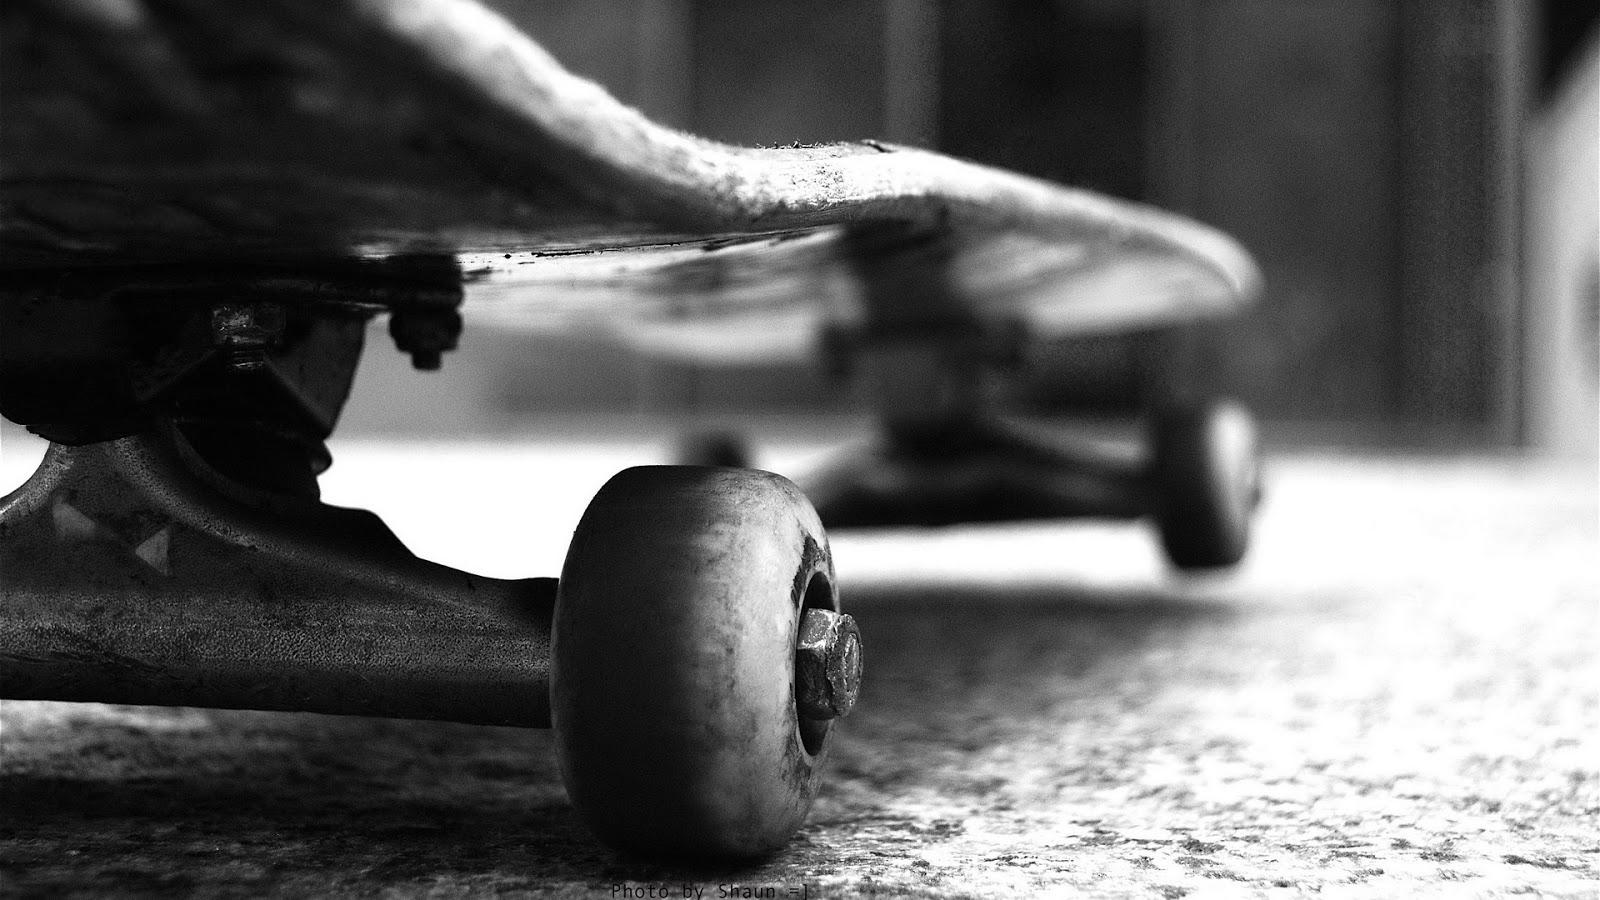 Imagenes ZT - Descarga fondos HD: Fondo Pantalla Skate Abandonado